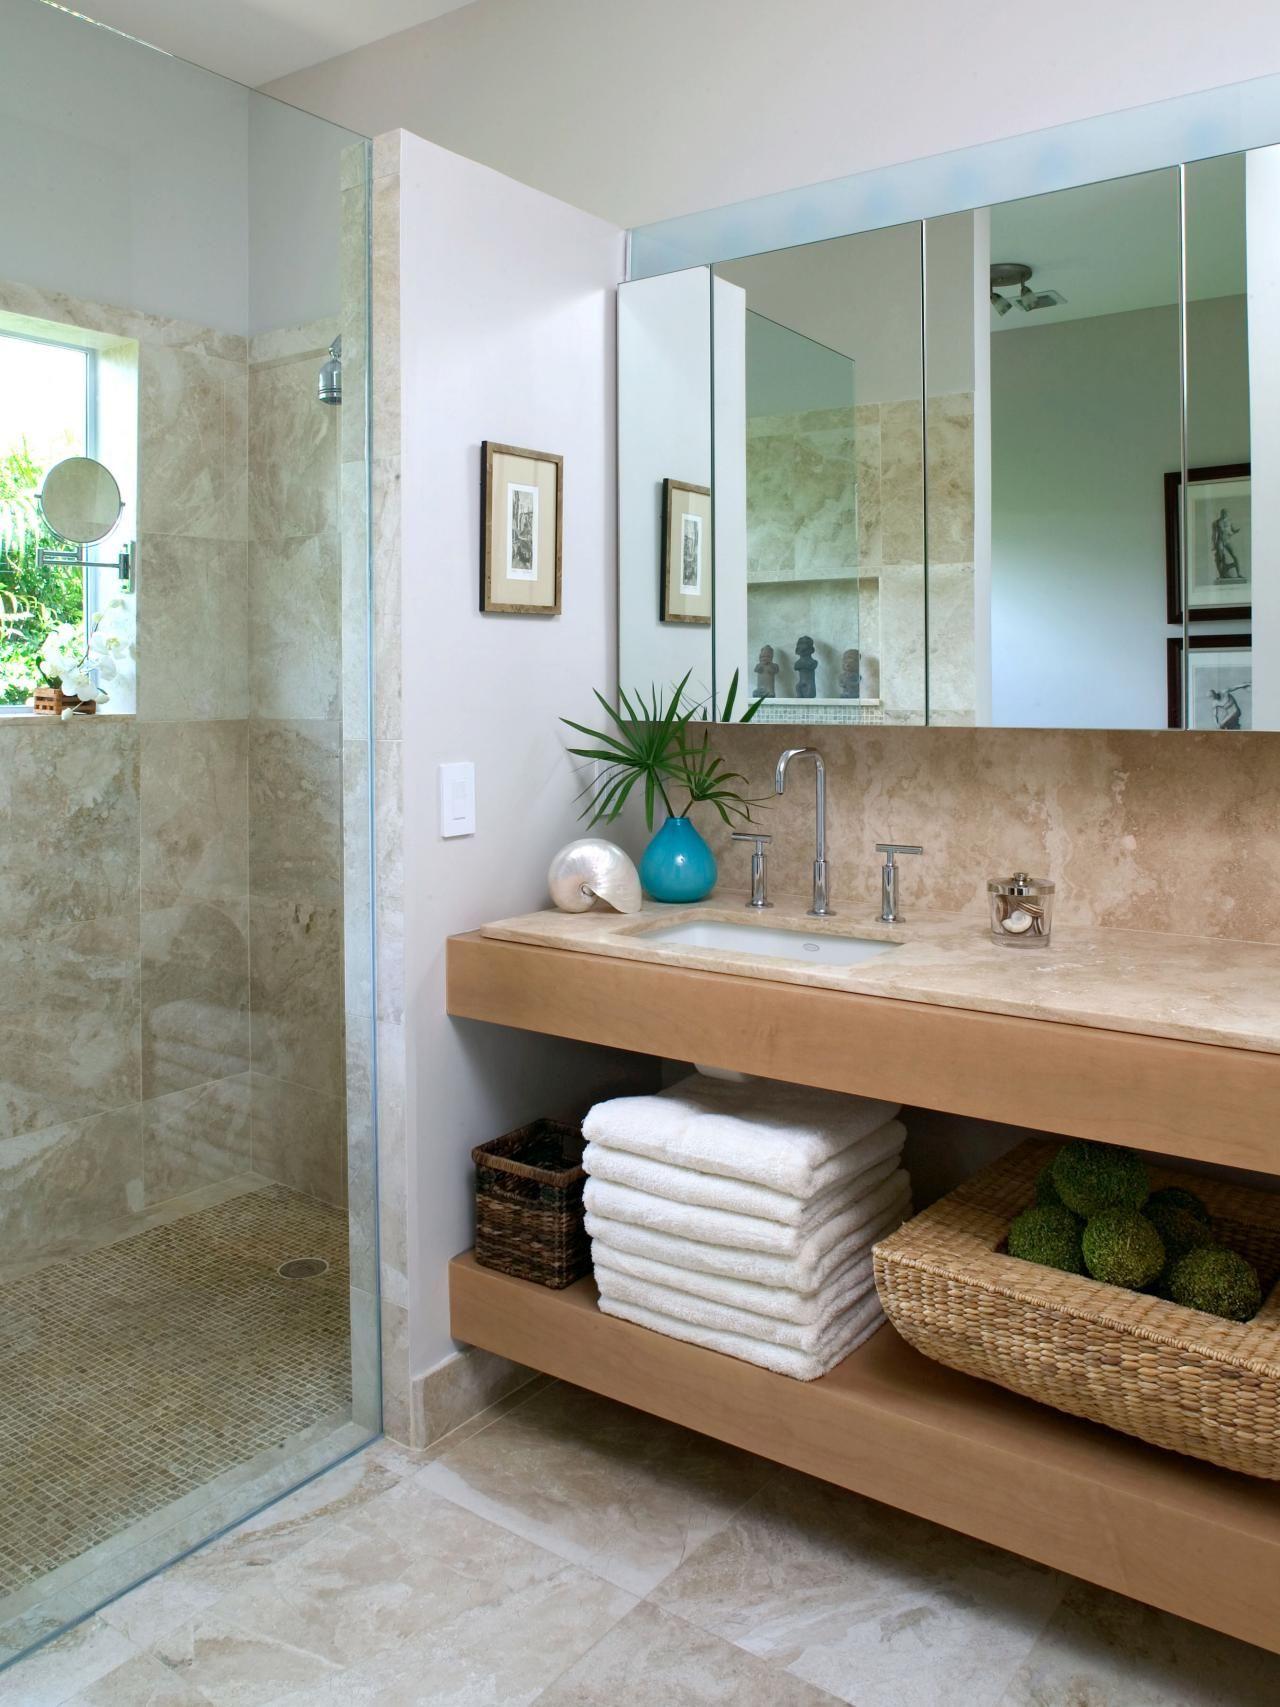 Best Kitchen Gallery: 25 Awesome Beach Style Bathroom Design Ideas Coastal Bathrooms of Beach Bathroom Design  on rachelxblog.com